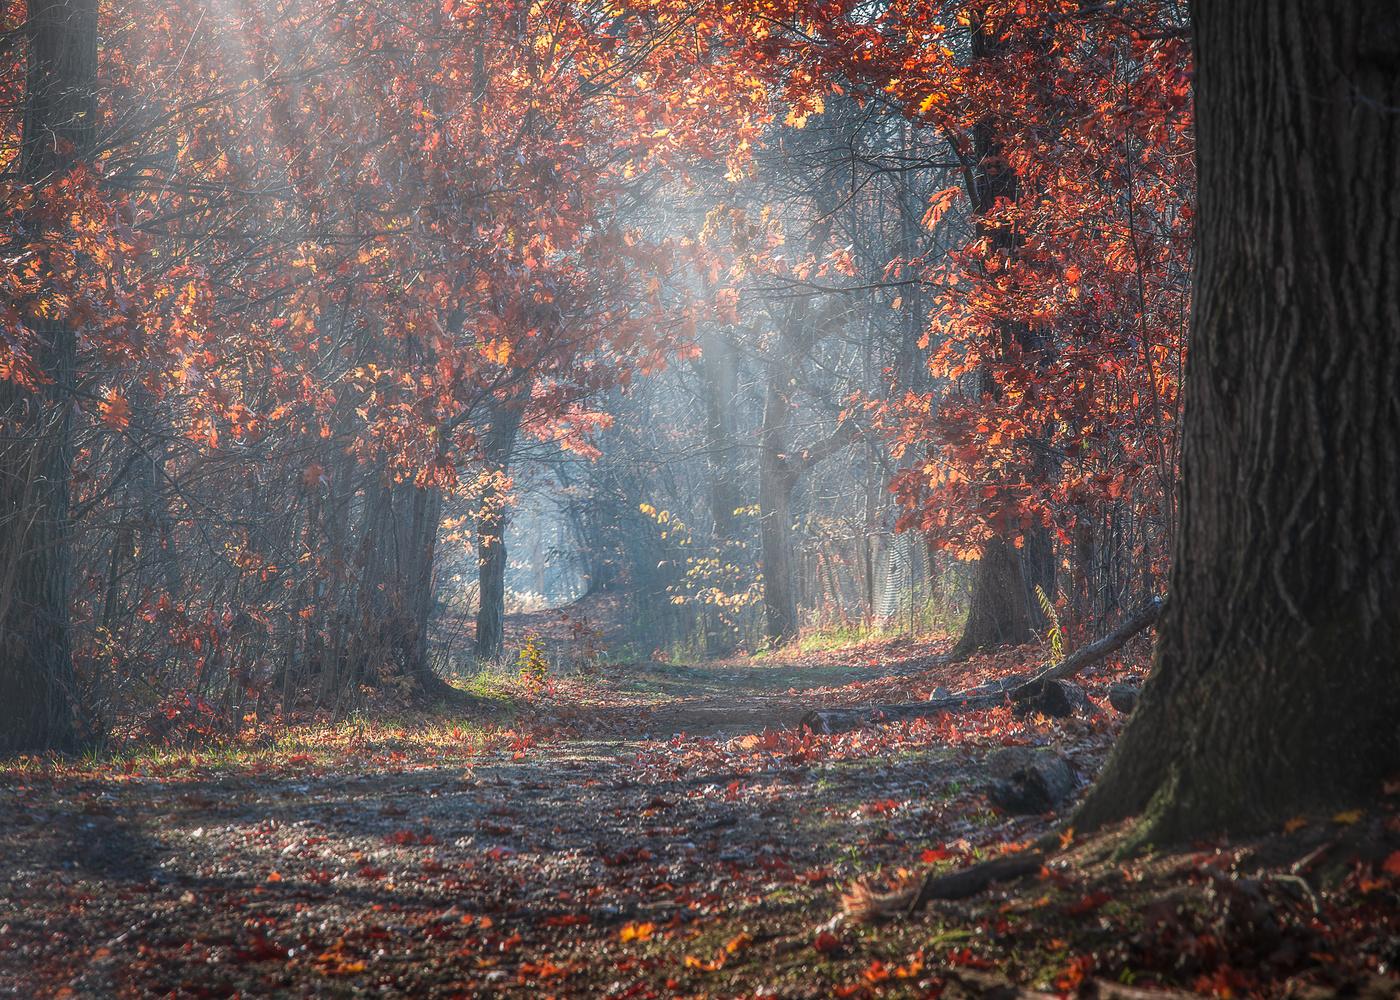 Autumn's end by Daniel Frost